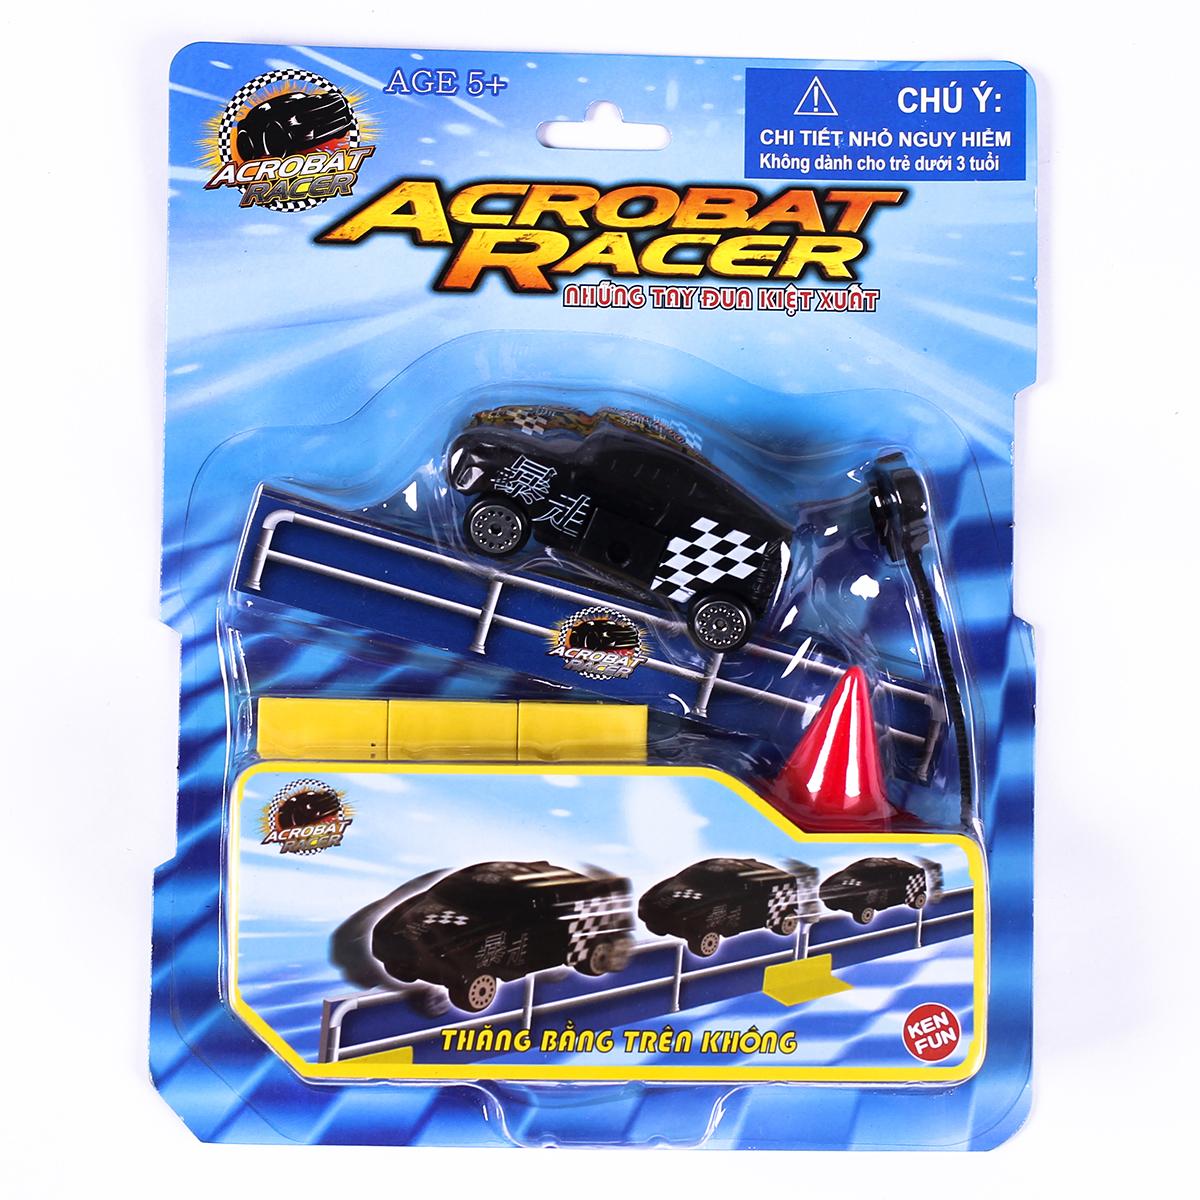 Xe do choi Acrobat Racer - Thang bang tren khong